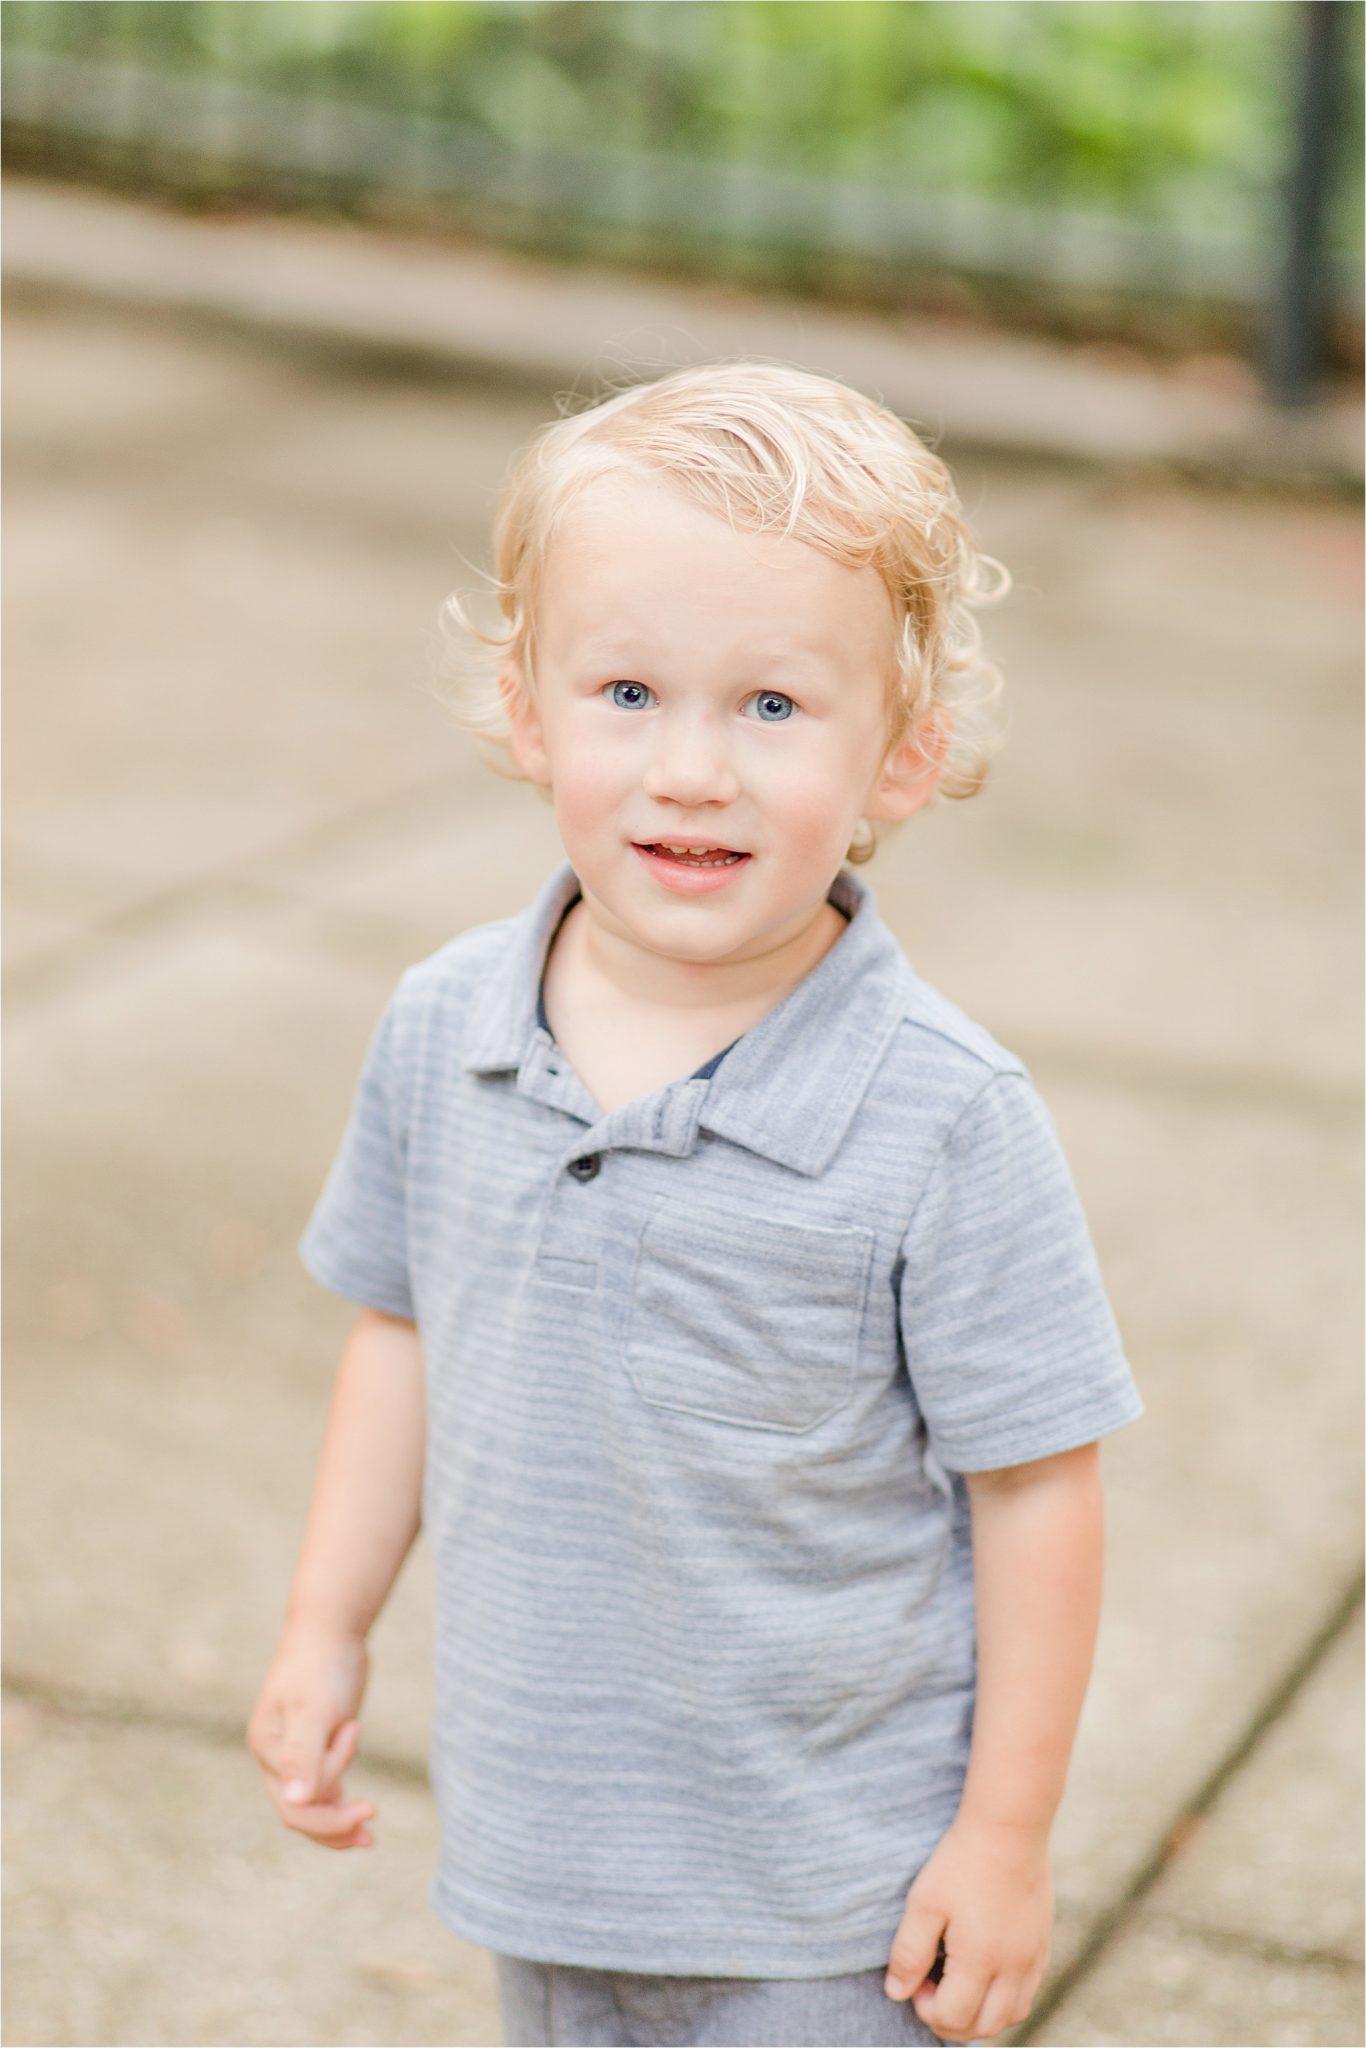 Washington Square Park Family Photography-Toddler photography-child portraits-photos